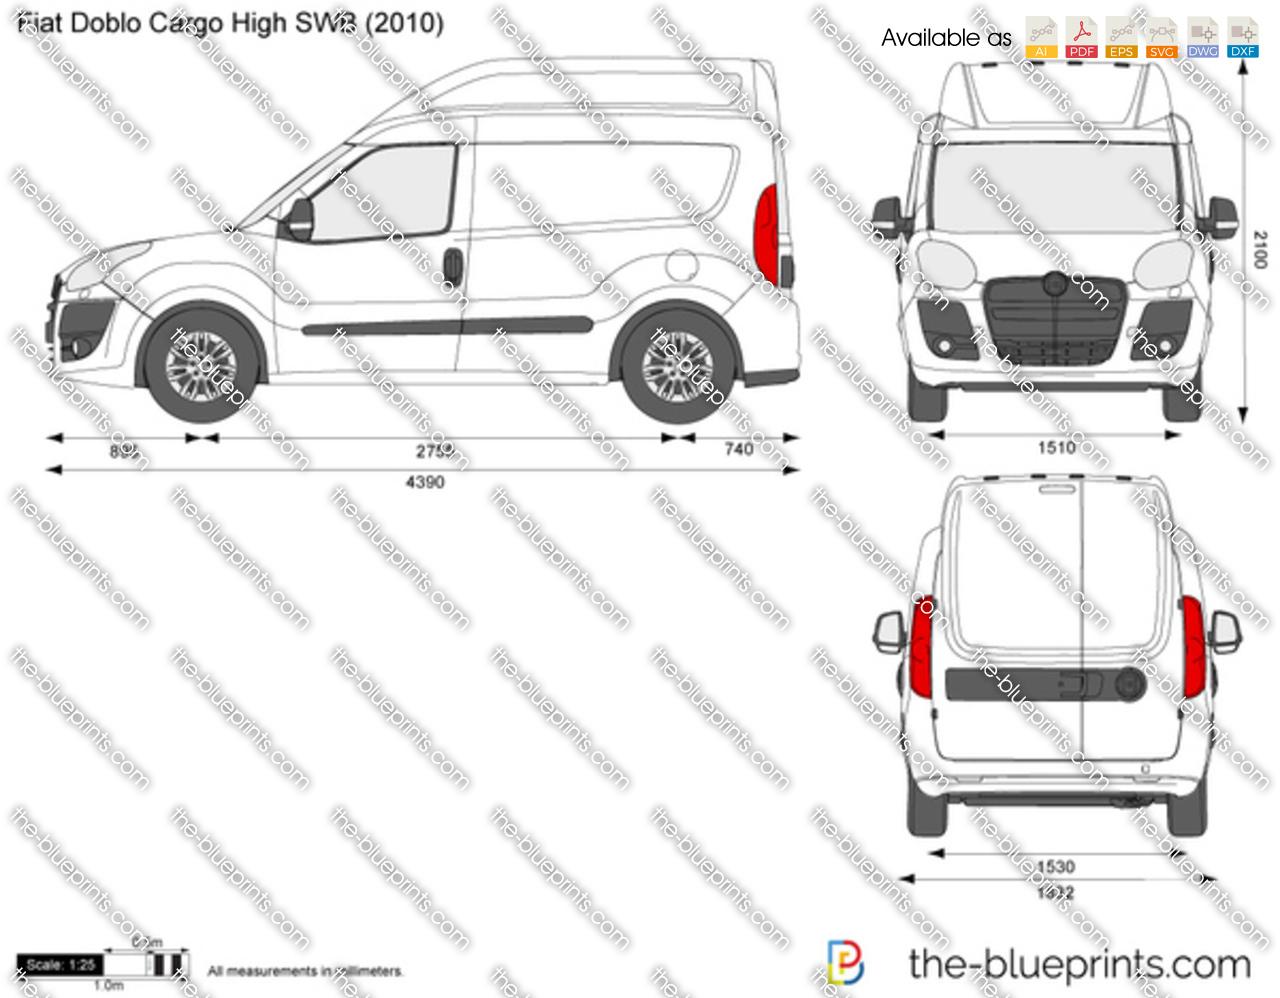 Fiat Doblo Cargo High SWB vector drawing